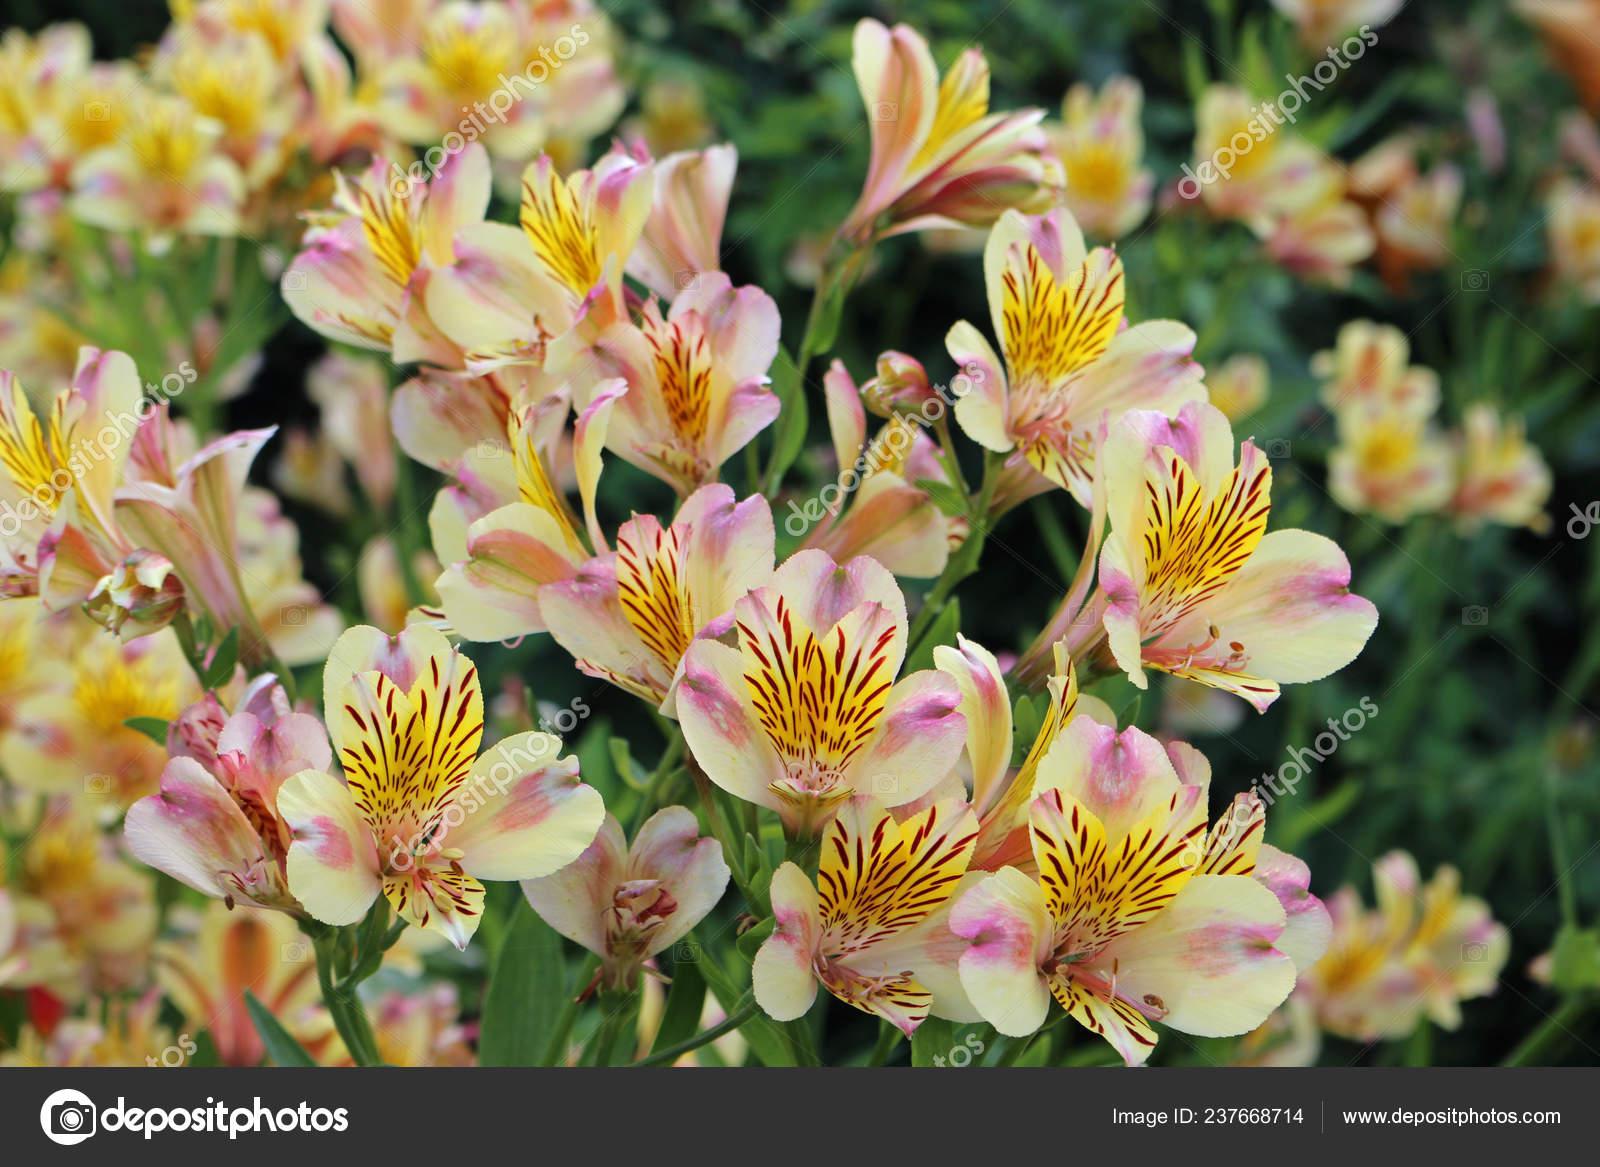 Pink Yellow Peruvian Lily Alstroemeria Flowers Flower Bed Leaves More Stock Photo C Johnatapw 237668714